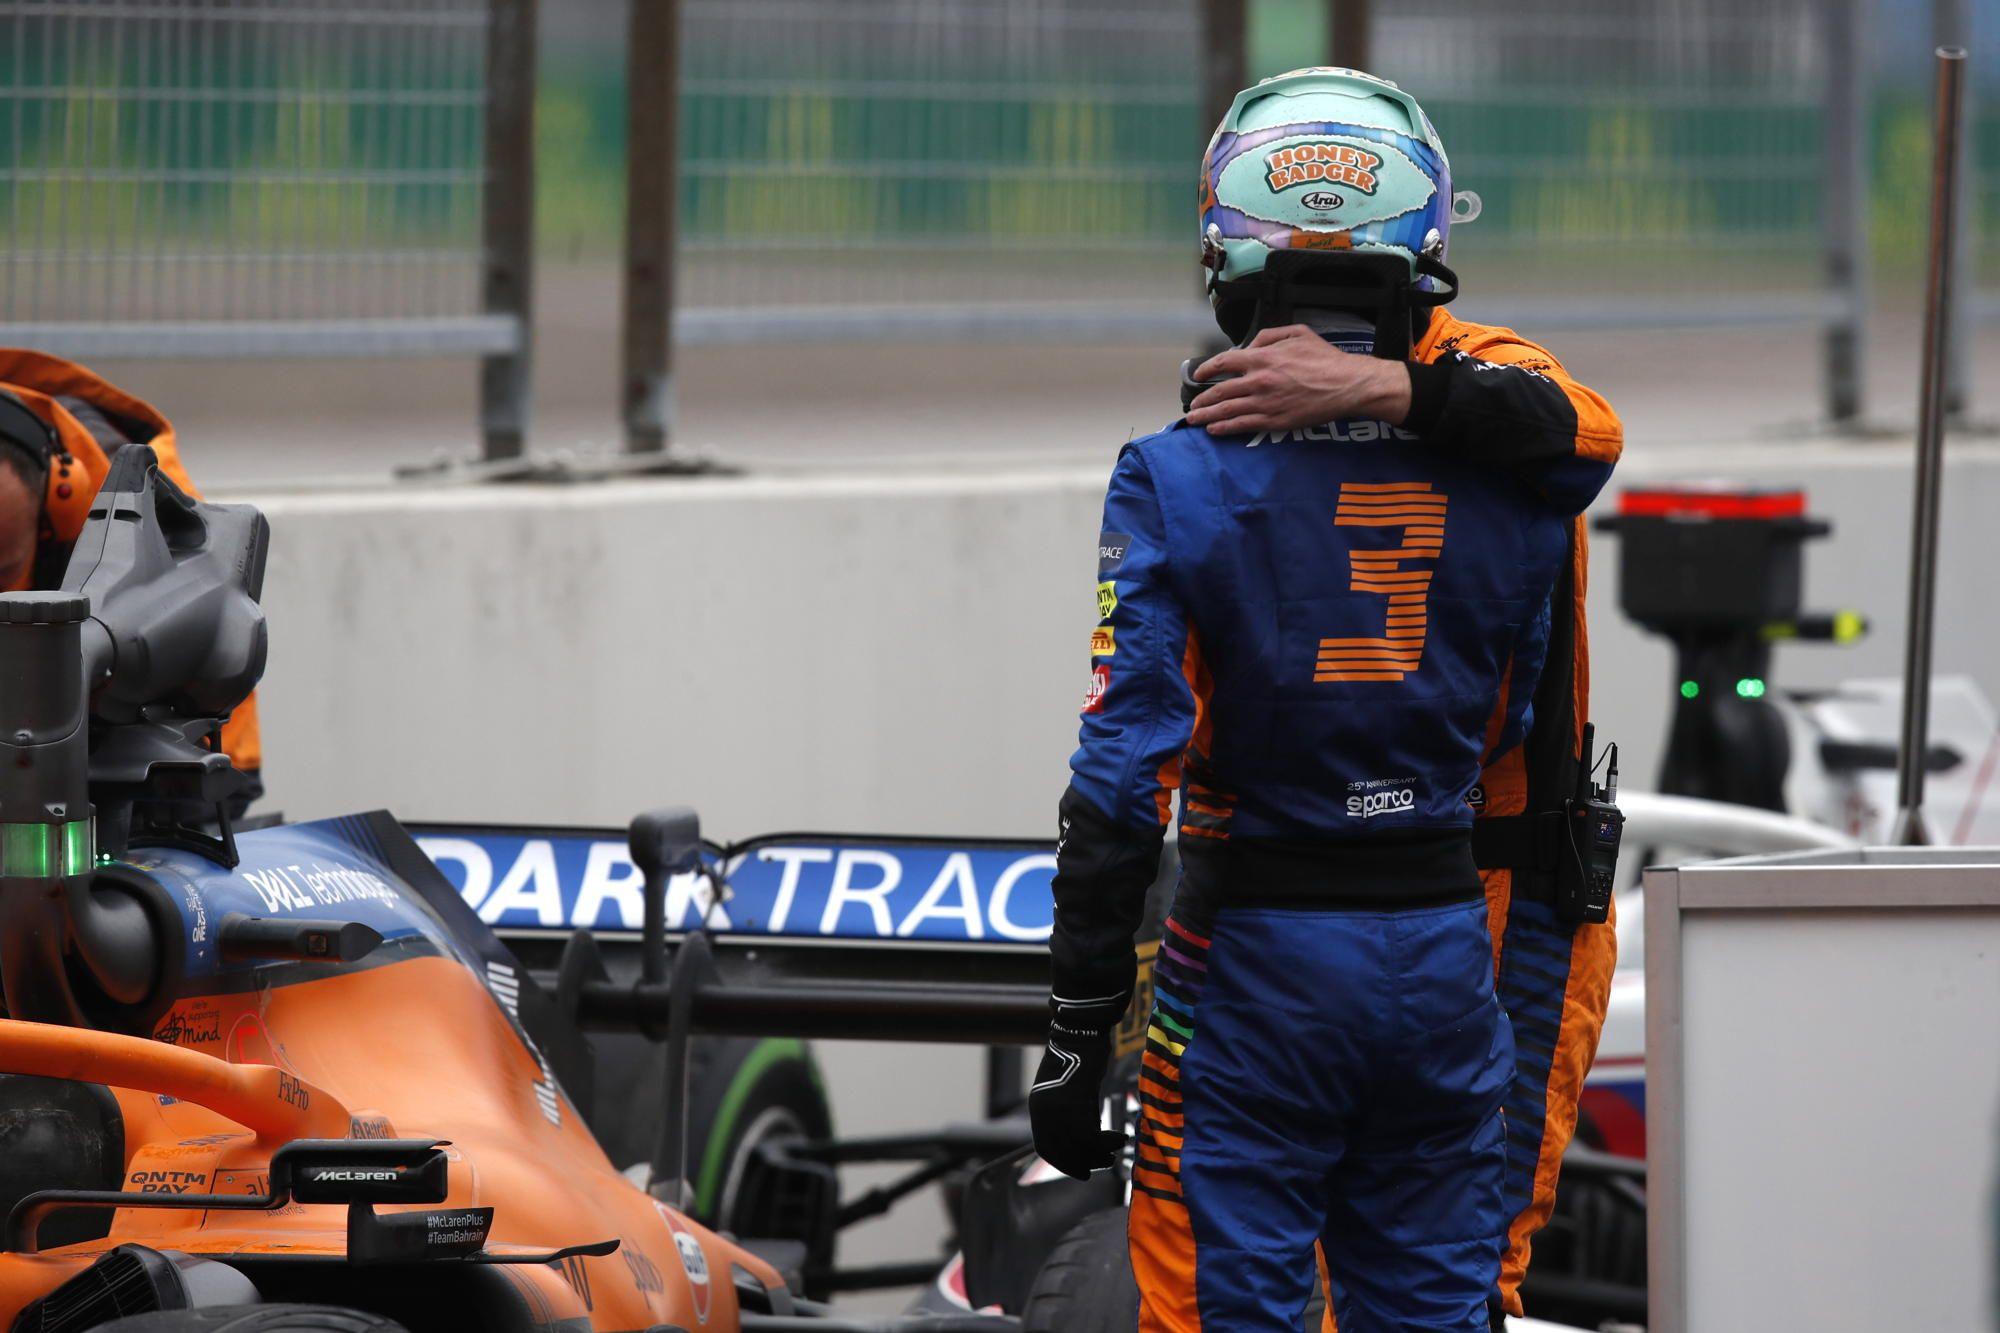 F1 - Daniel Ricciardo a souffert durant toute la course en Turquie